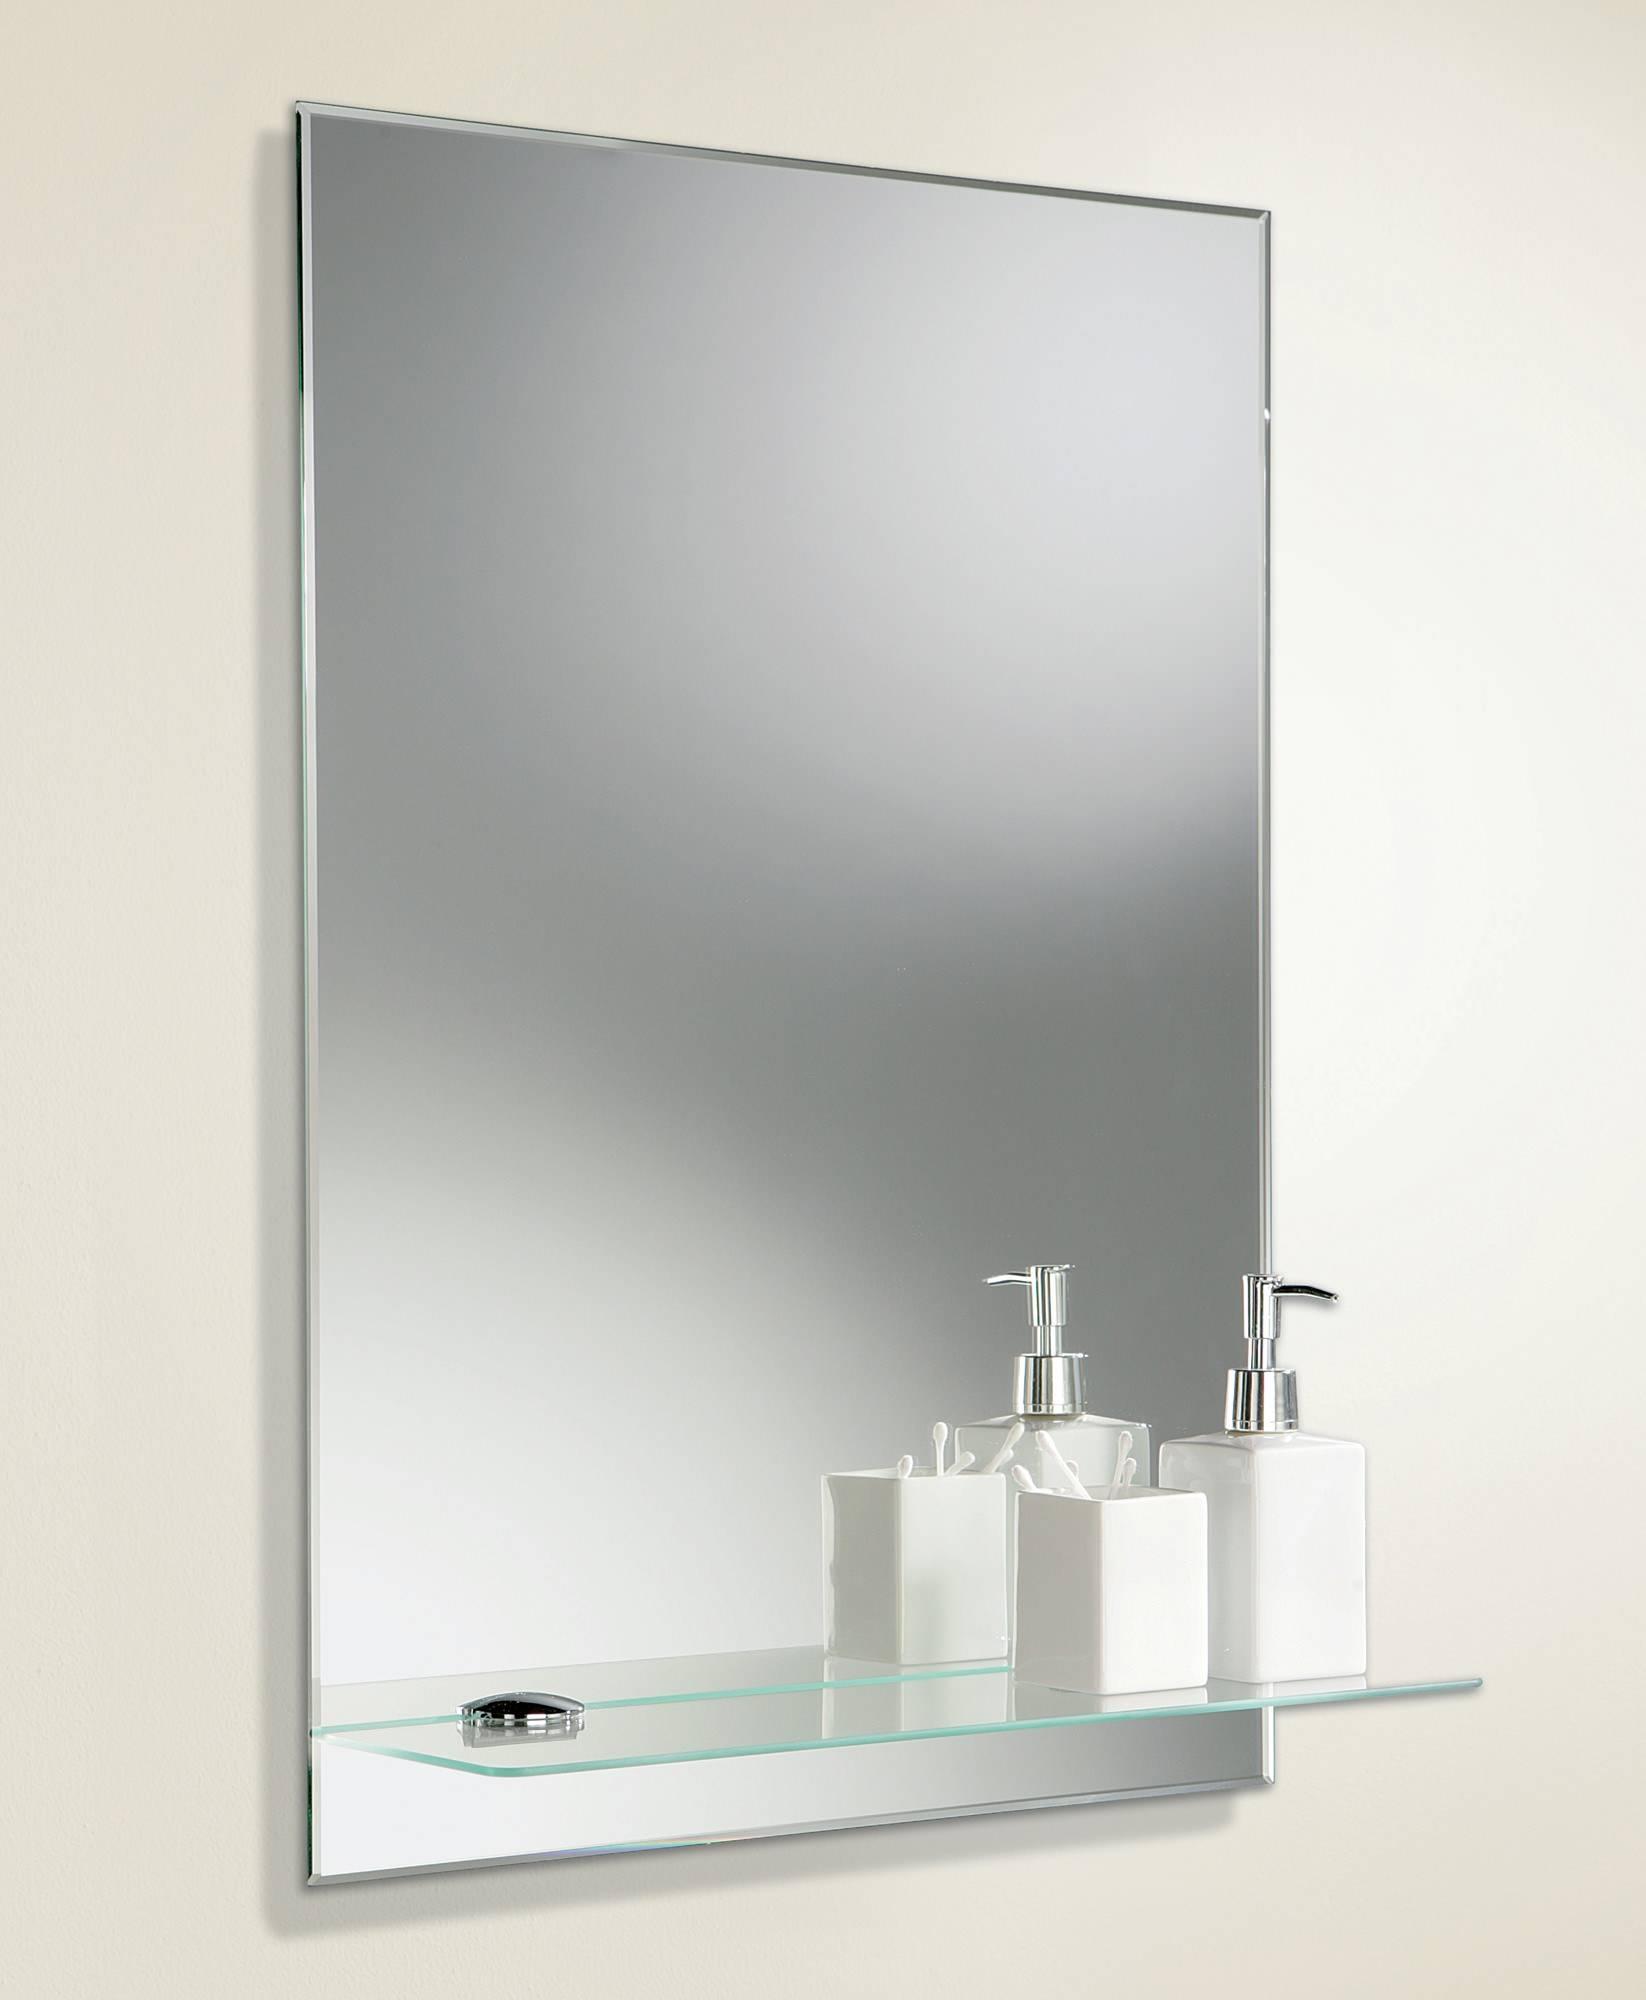 Hib Delby Rectangular Bevelled Edge Mirror With Glass Shelf | 72026000 with regard to Bevelled Edge Mirrors (Image 7 of 15)